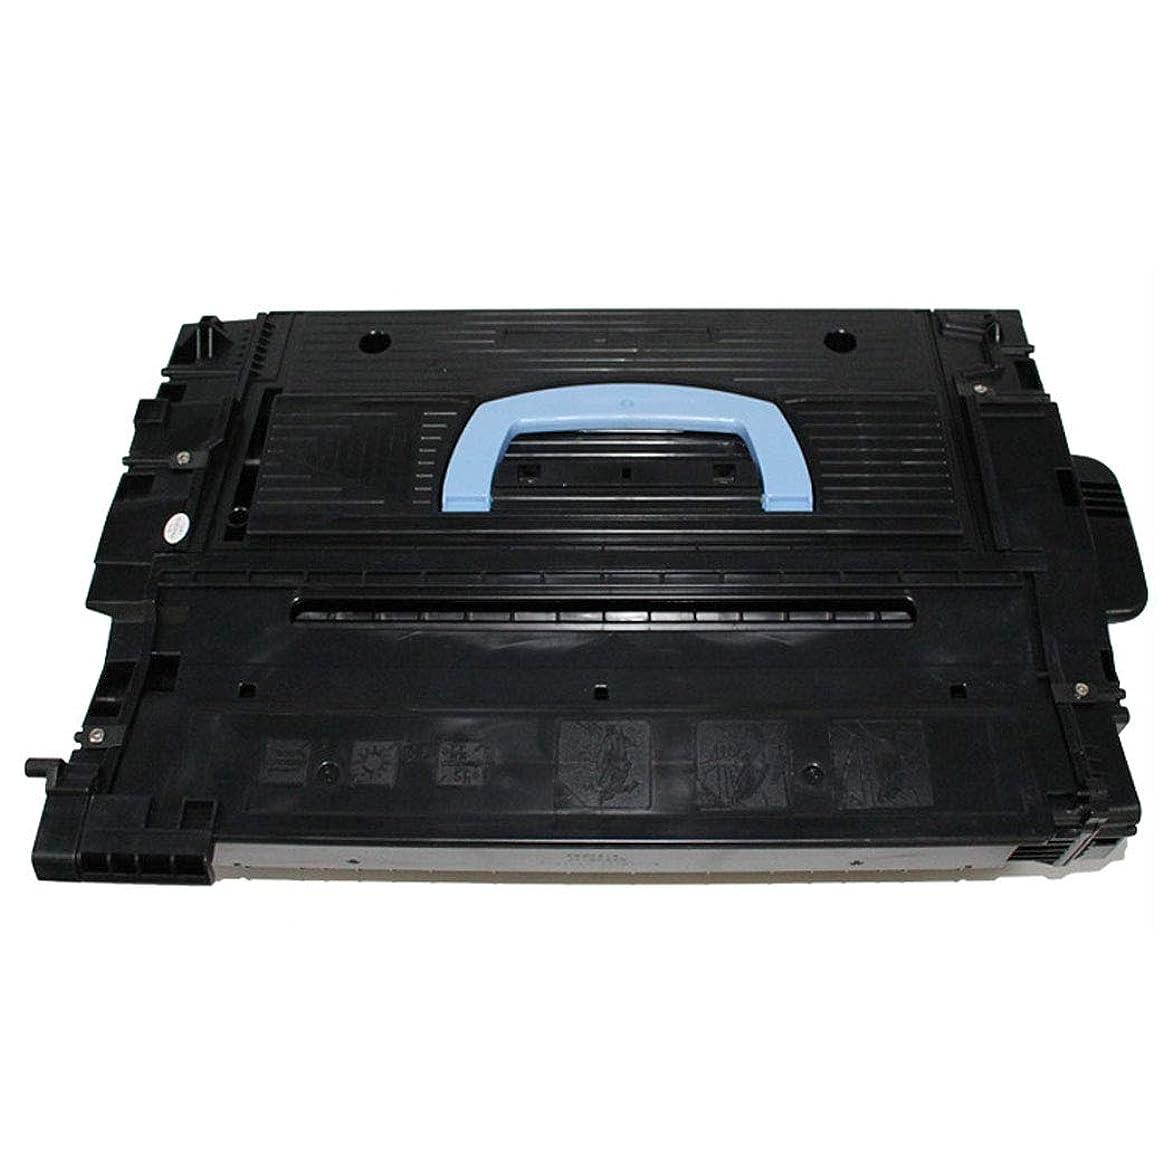 MALPYQA Compatible with HP C8543X Toner cartridges for HP 9000/9000N/9000DN/9000HNS/9000HNF/9040/9040N/9040DN/9050/9050DN Printer cartridges,ProfessionalVersion